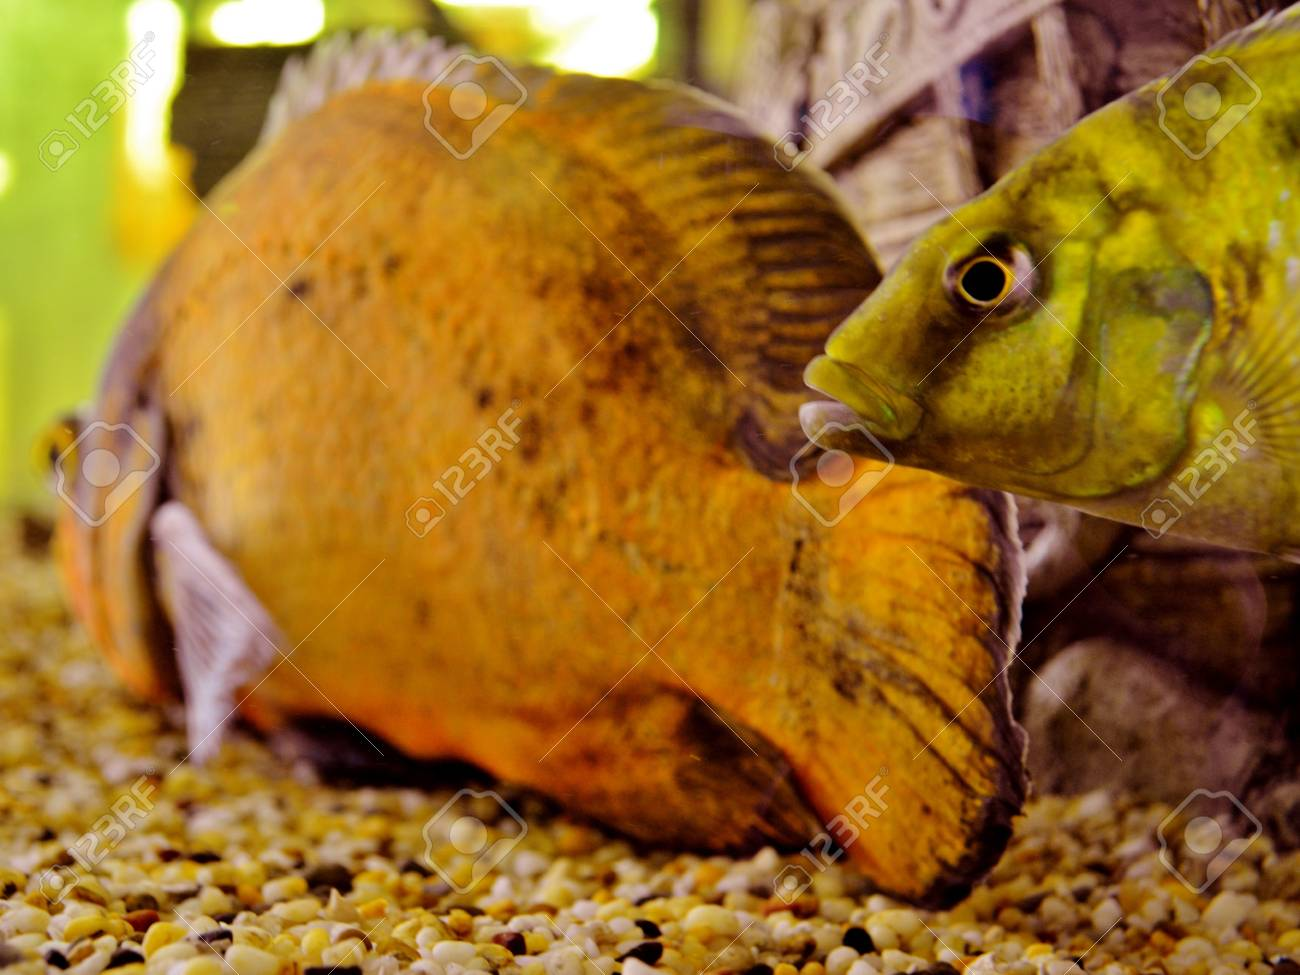 Oscar Fish in a tank in Innisfail in Queensland Australia